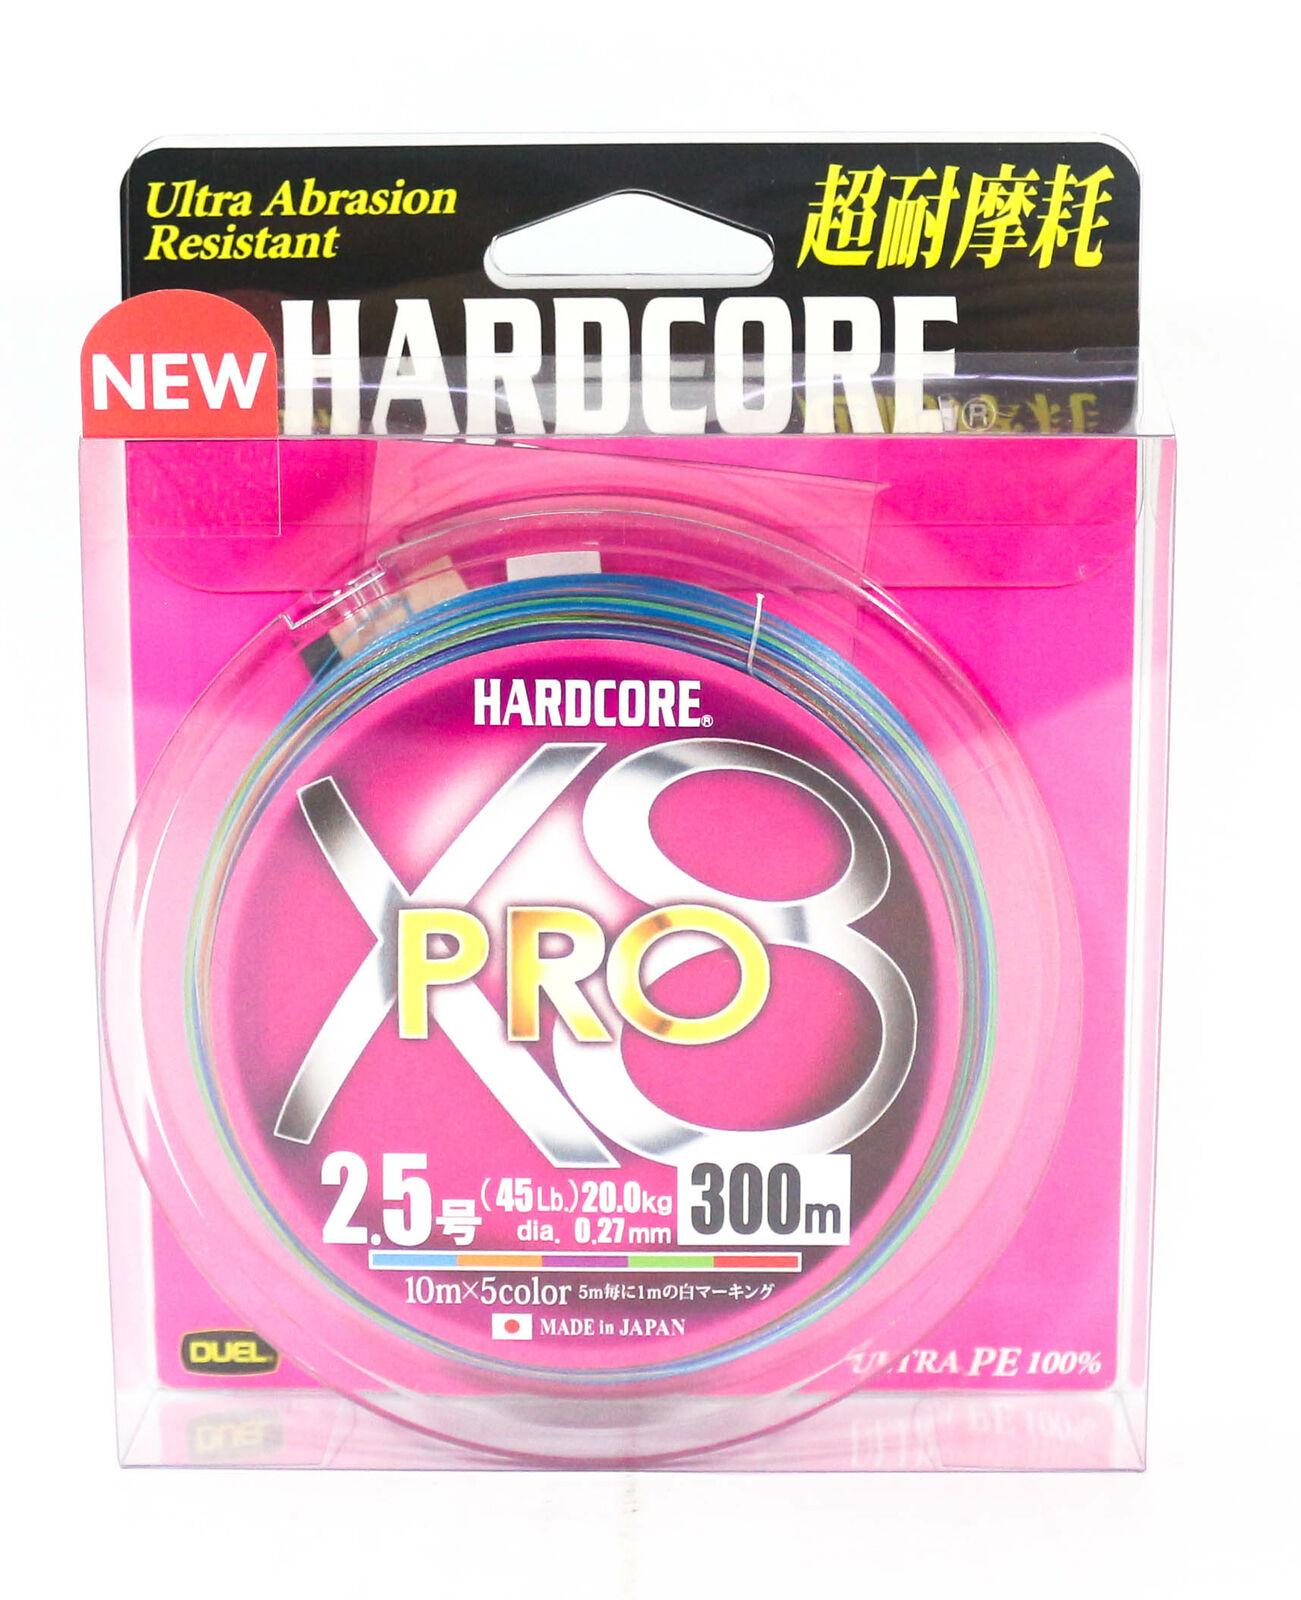 Yo Zuri Duel P.E Linie Hardcore X8 Pro 300m P.E 2.5 20Kg 5 Color H3899 0.27mm